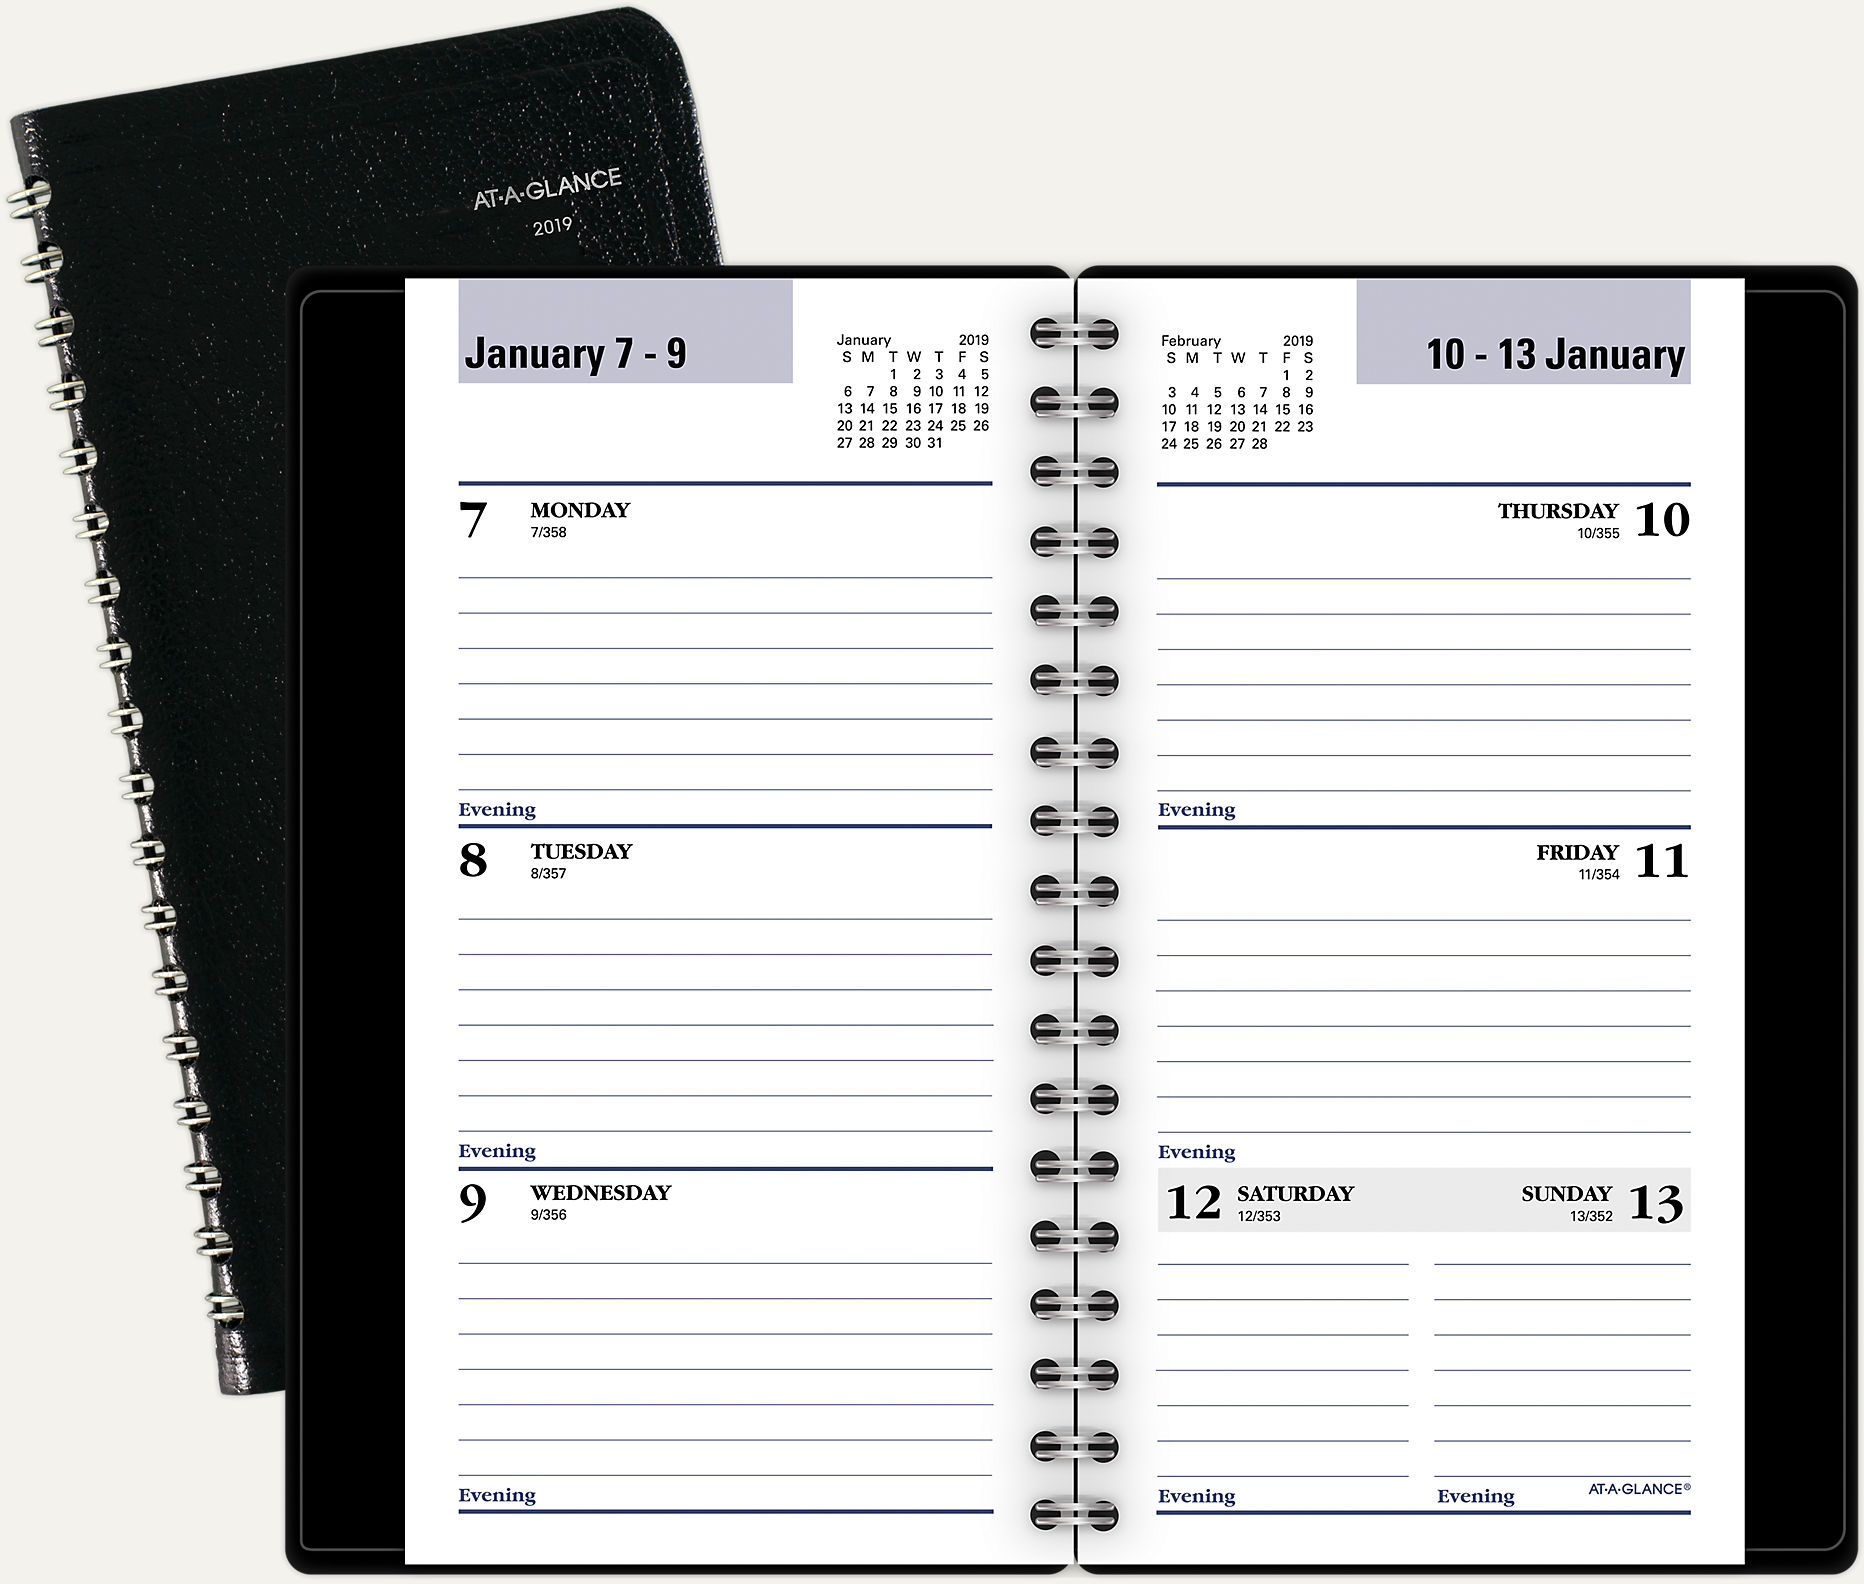 December 21 2020 Day Minder Printable Daily Calendar DayMinder Weekly Pocket Planner | G232 | AT A GLANCE